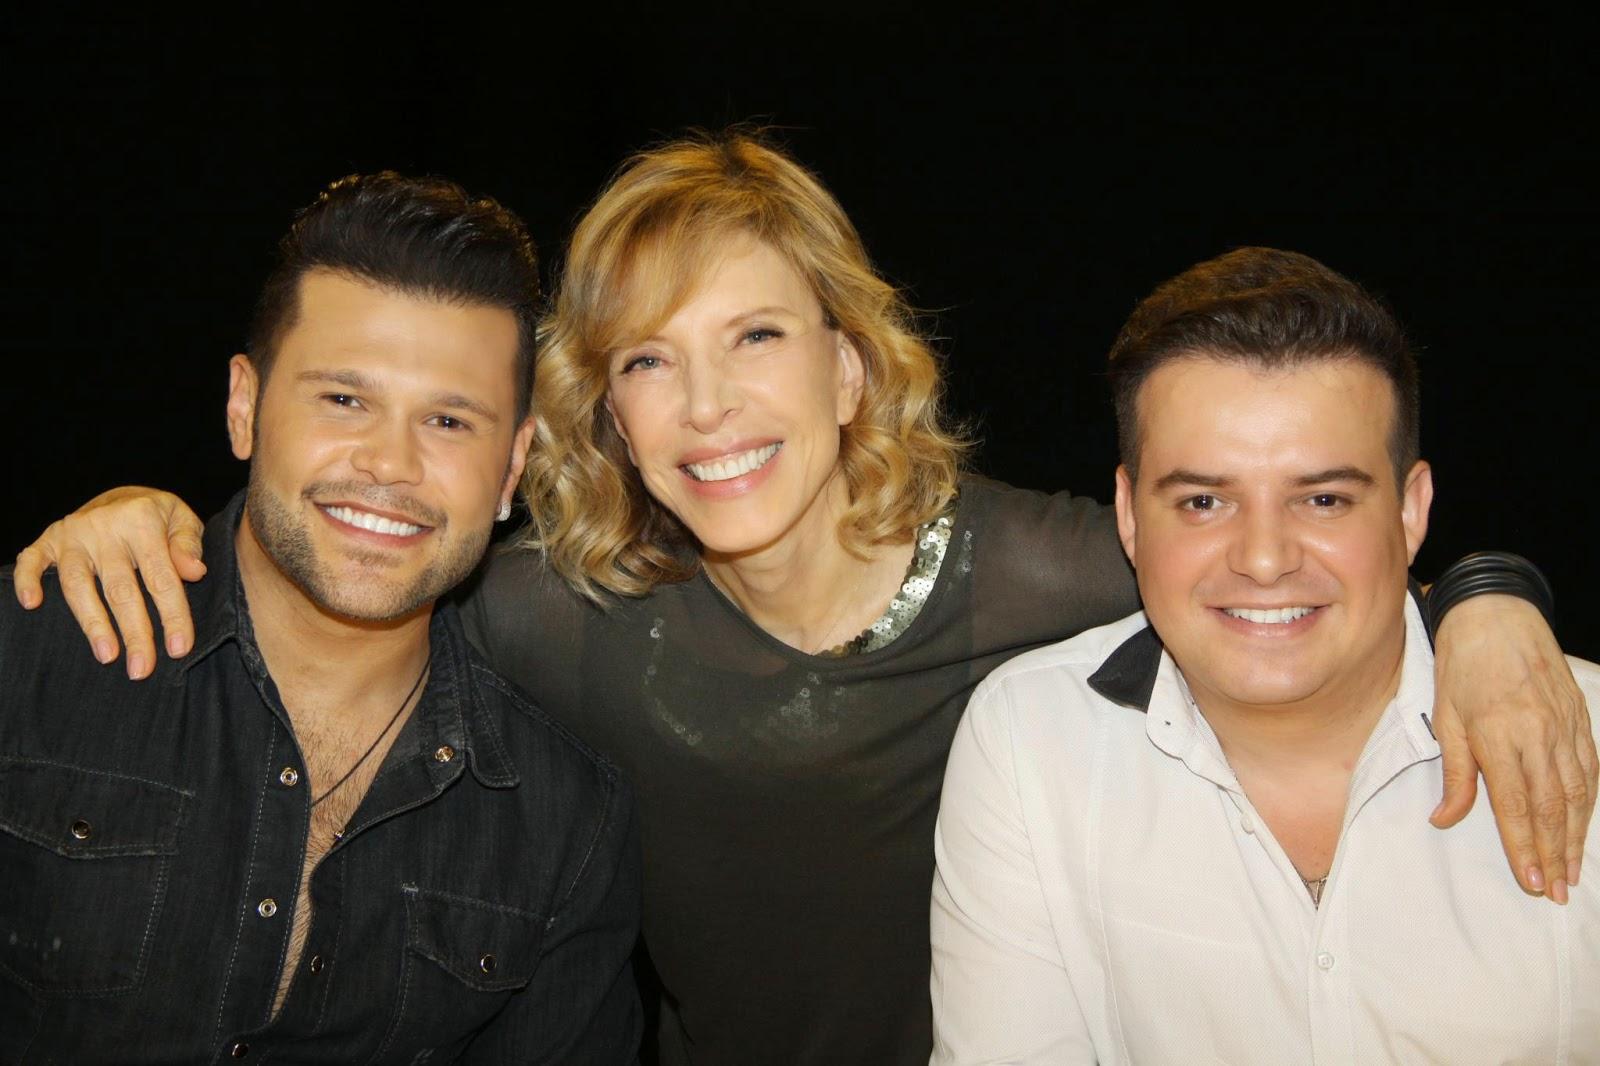 Marcos, Gabi e Belutti (Crédito: Carol Soares/SBT)